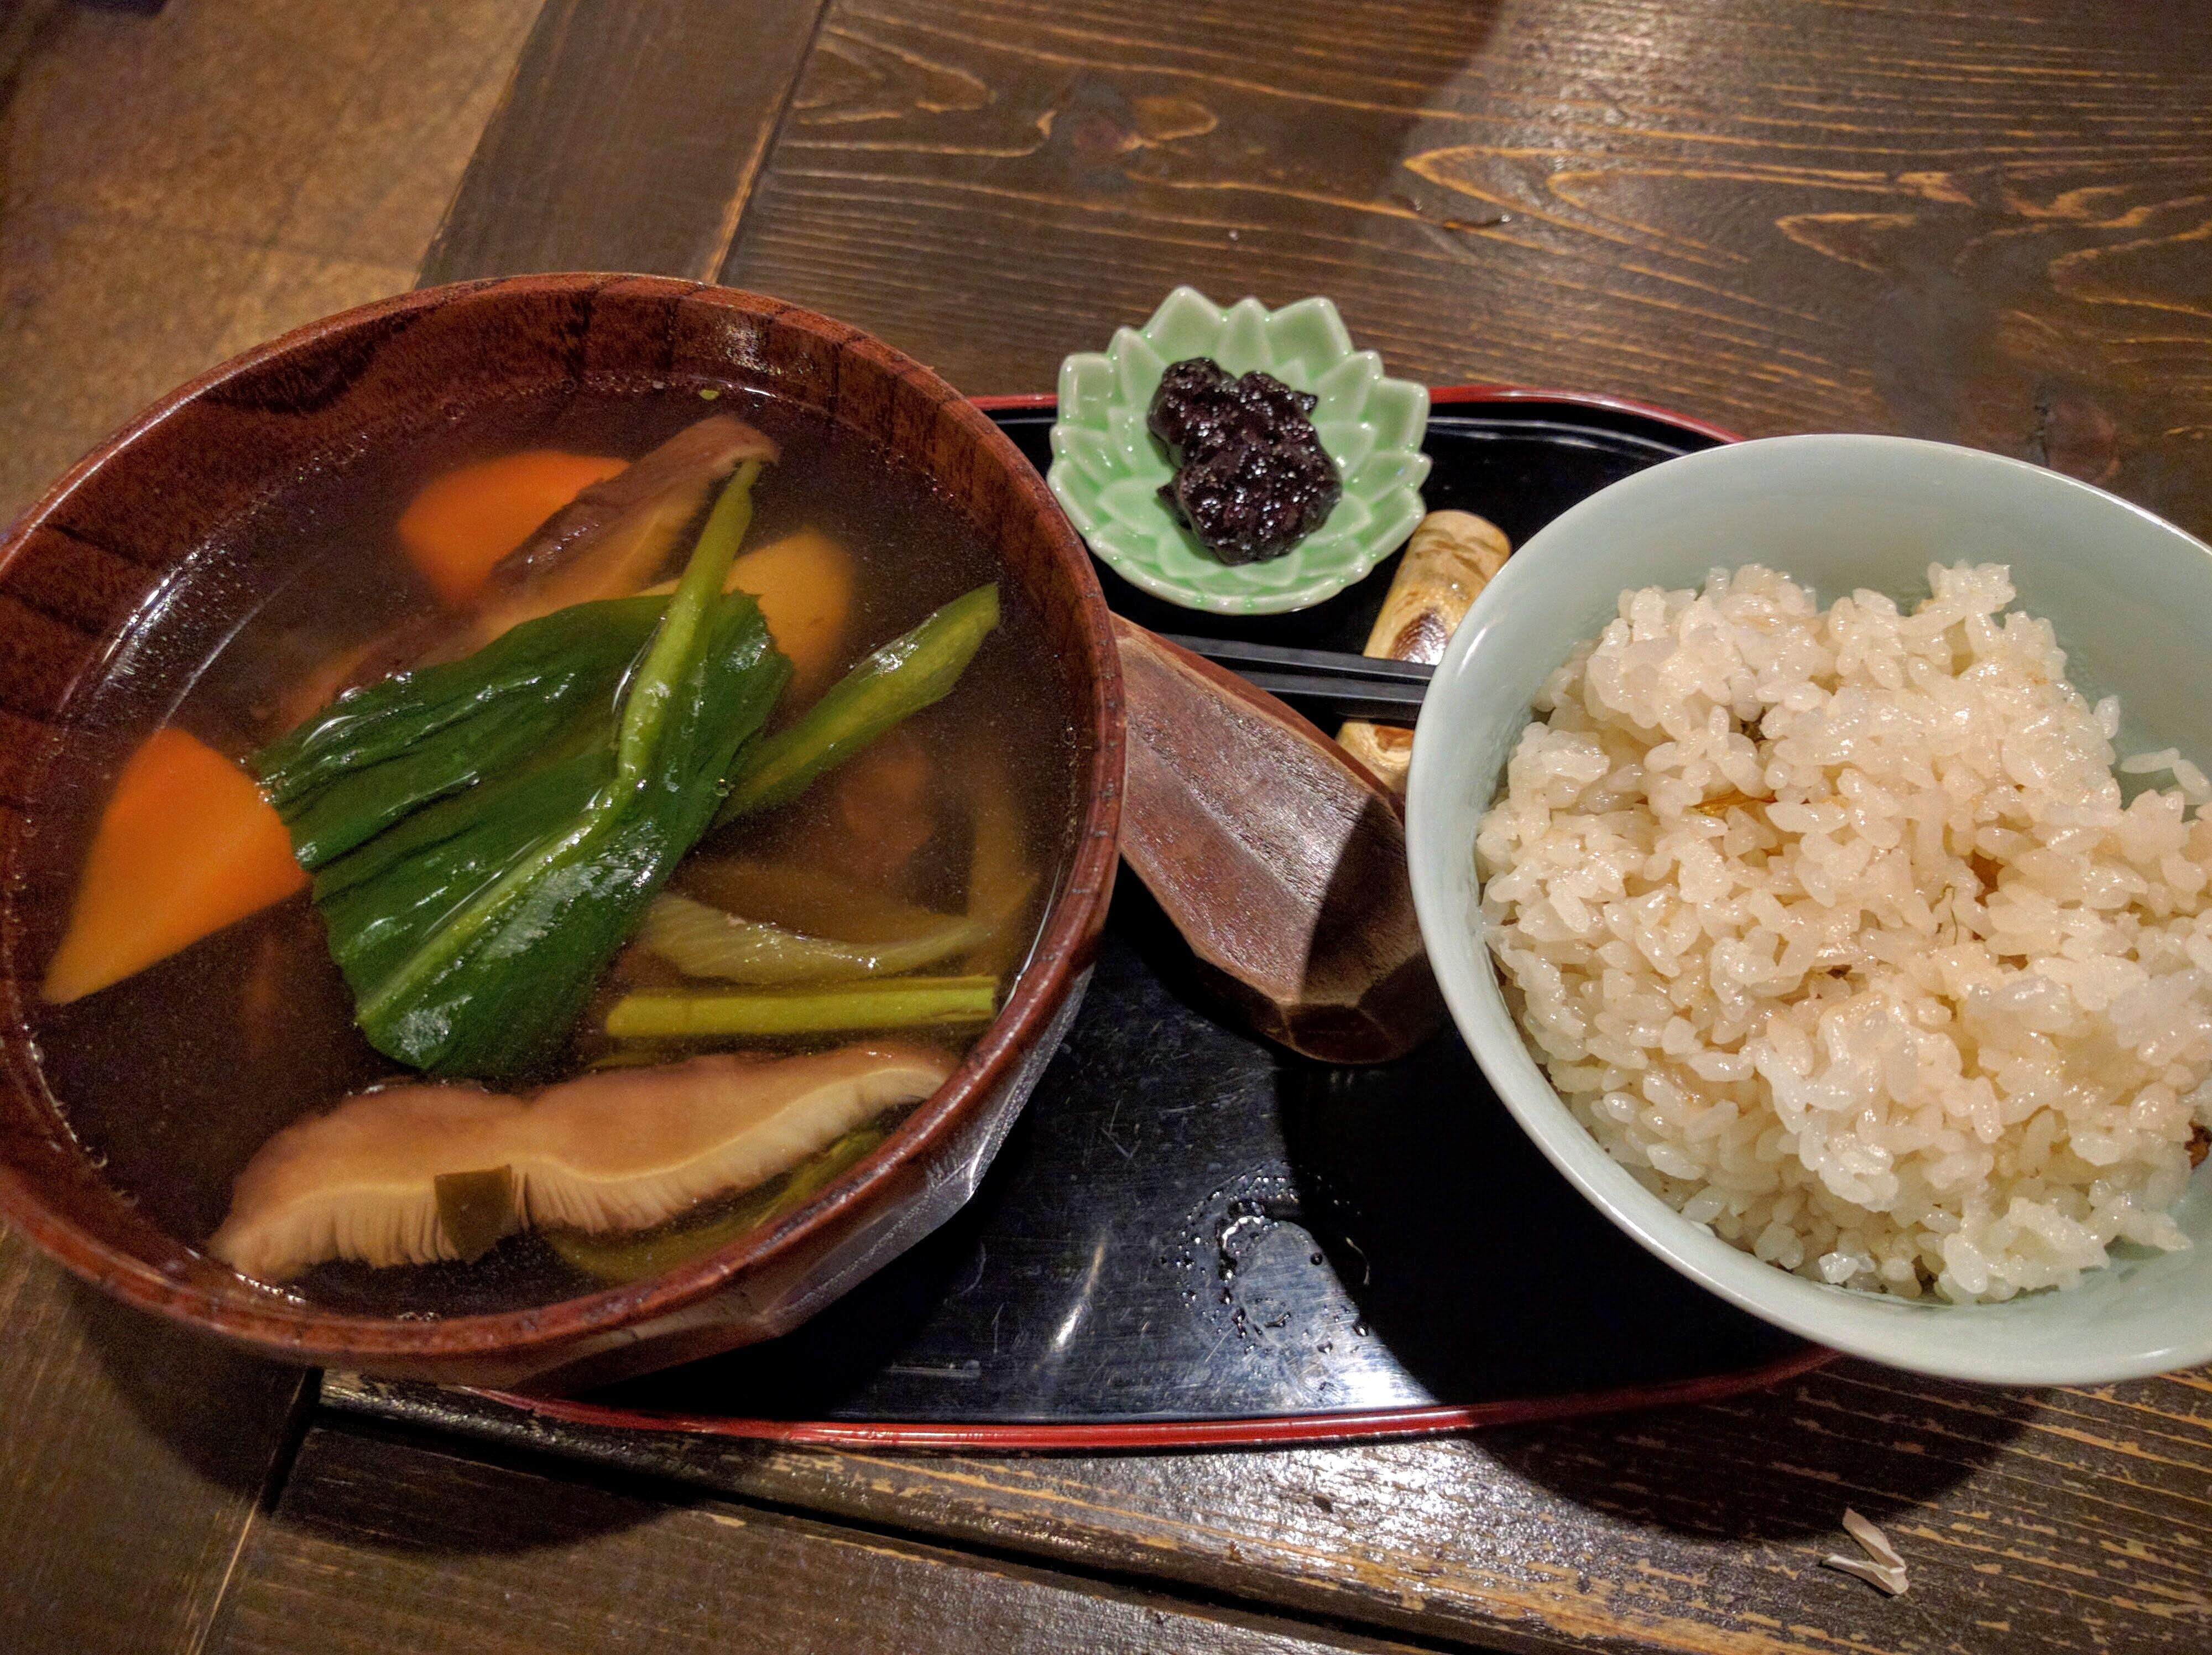 AinuSetMeal.jpg - Cafe Poronno Meal in Hokkaido, Japan